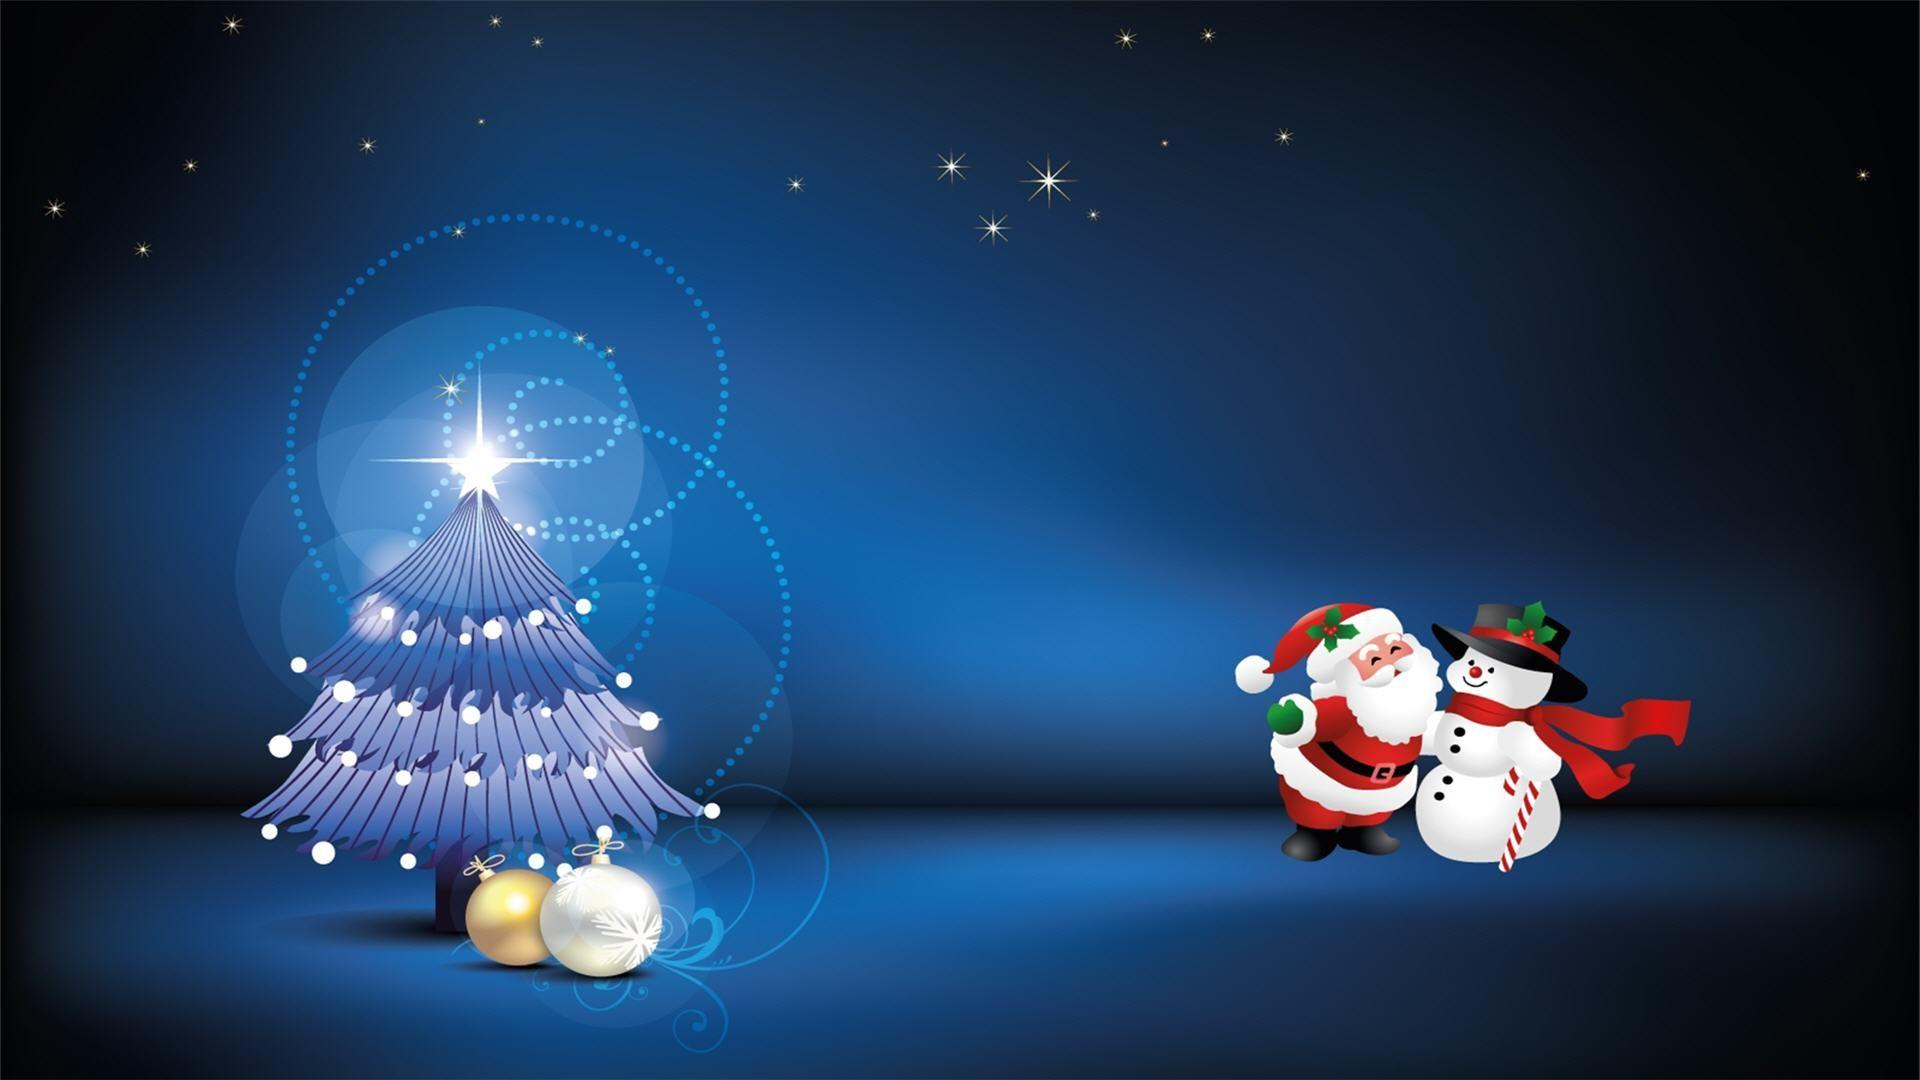 Animated Christmas Wallpaper Hd 352140 Hd Wallpaper